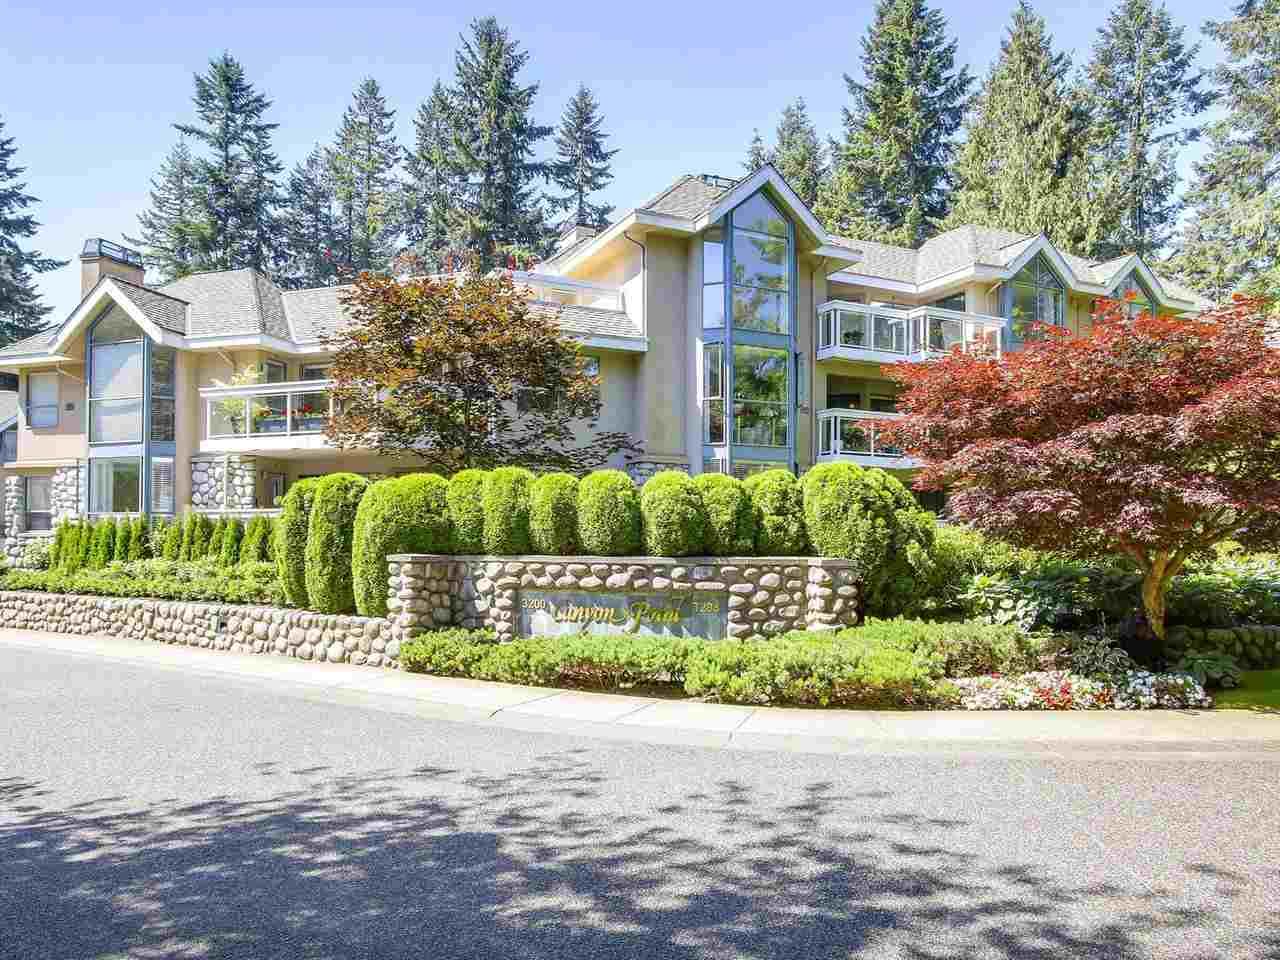 Condo Apartment at 304 3288 CAPILANO CRESCENT, Unit 304, North Vancouver, British Columbia. Image 1